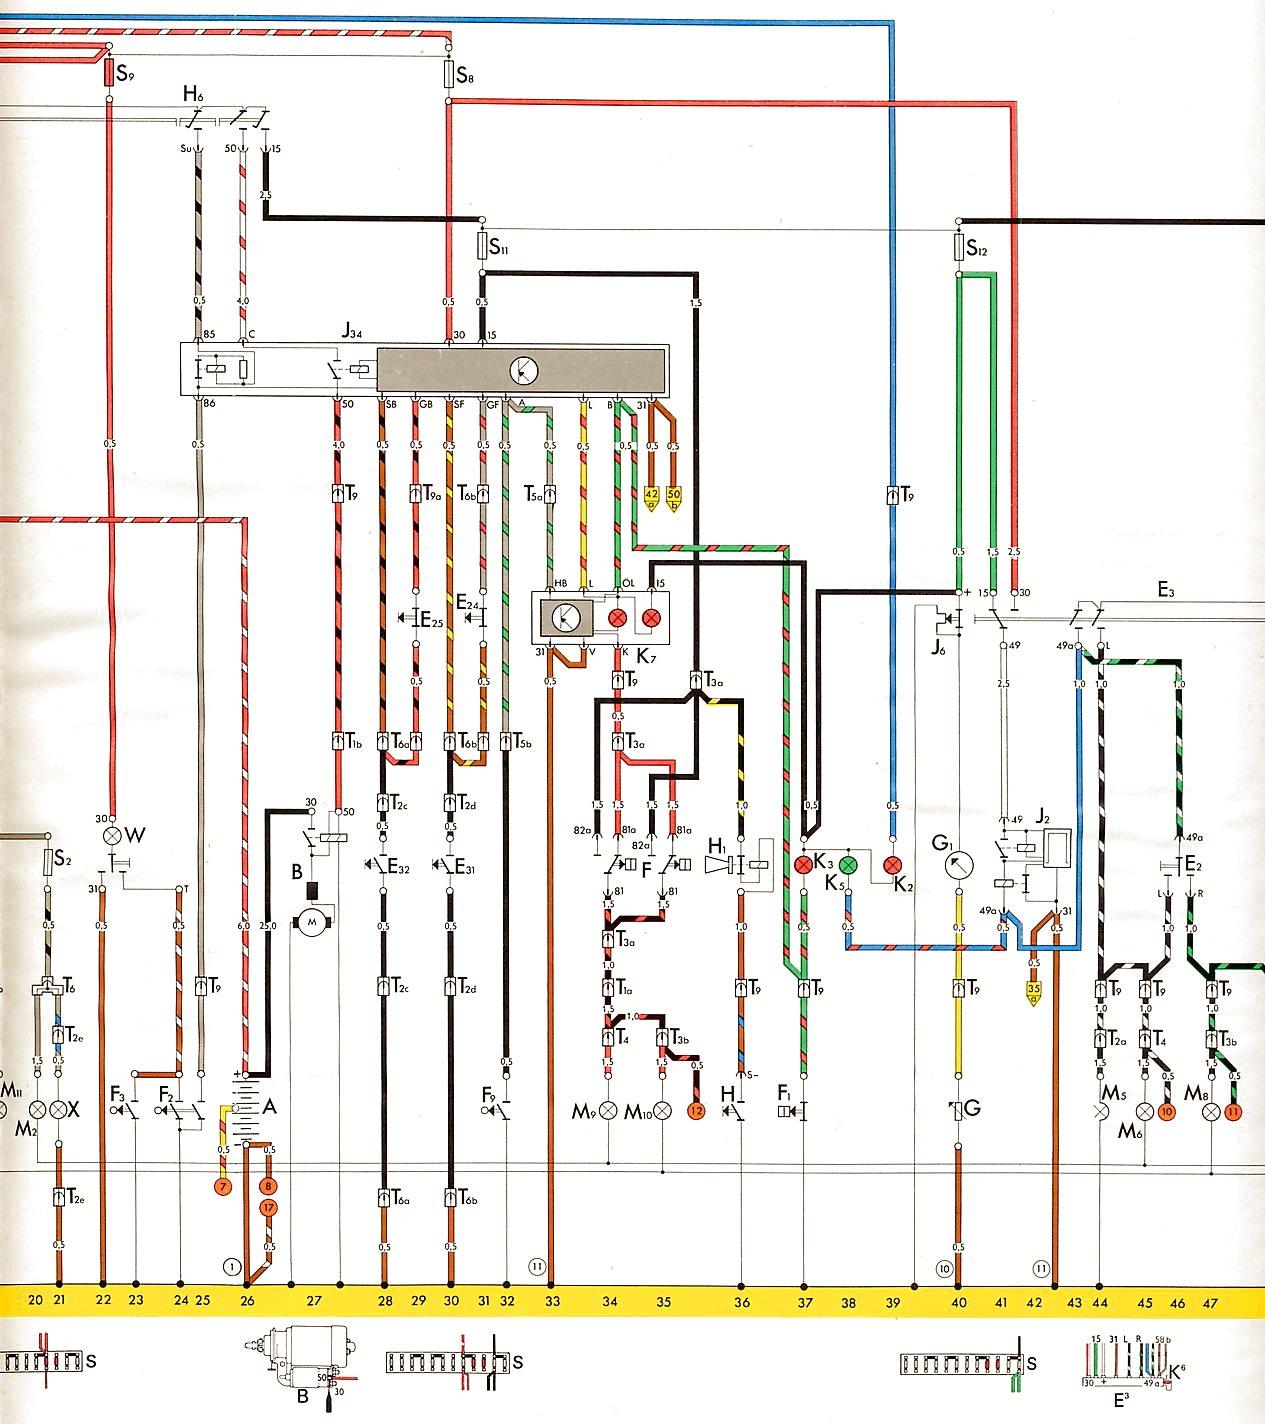 volvo s60 fuse diagram 1956 mercury monterey wiring diagram 2002 volvo s60 fuse box location  Volvo 850 Fuse 2002 Nissan Maxima Fuse Diagram 2000 Volvo S40 Fuse Box Location